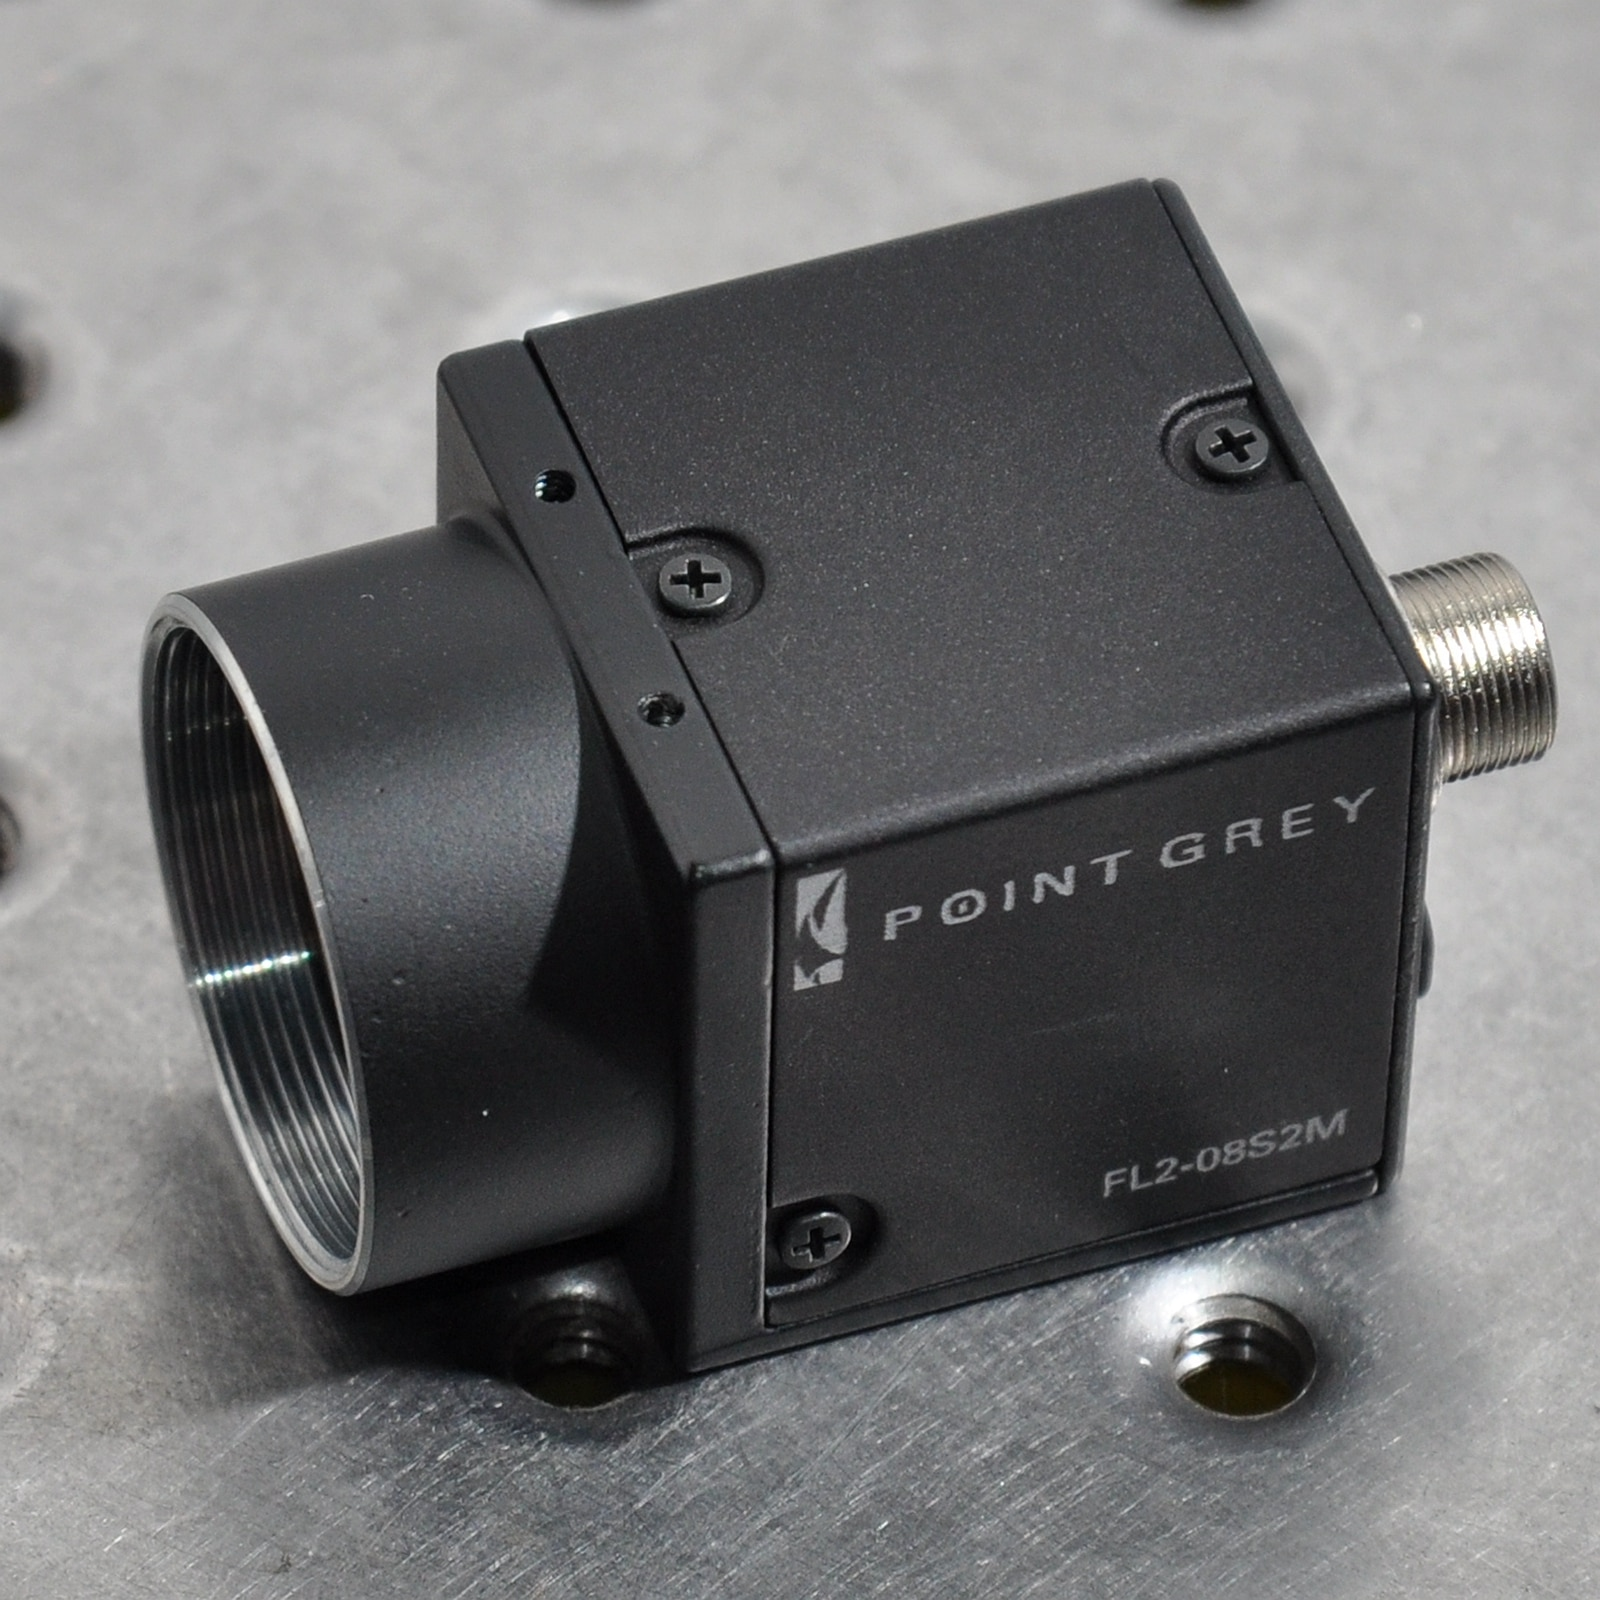 Canada Point Grey FL2-08S2M IEEE-1394 Digital Camera industrial camera CCD camera